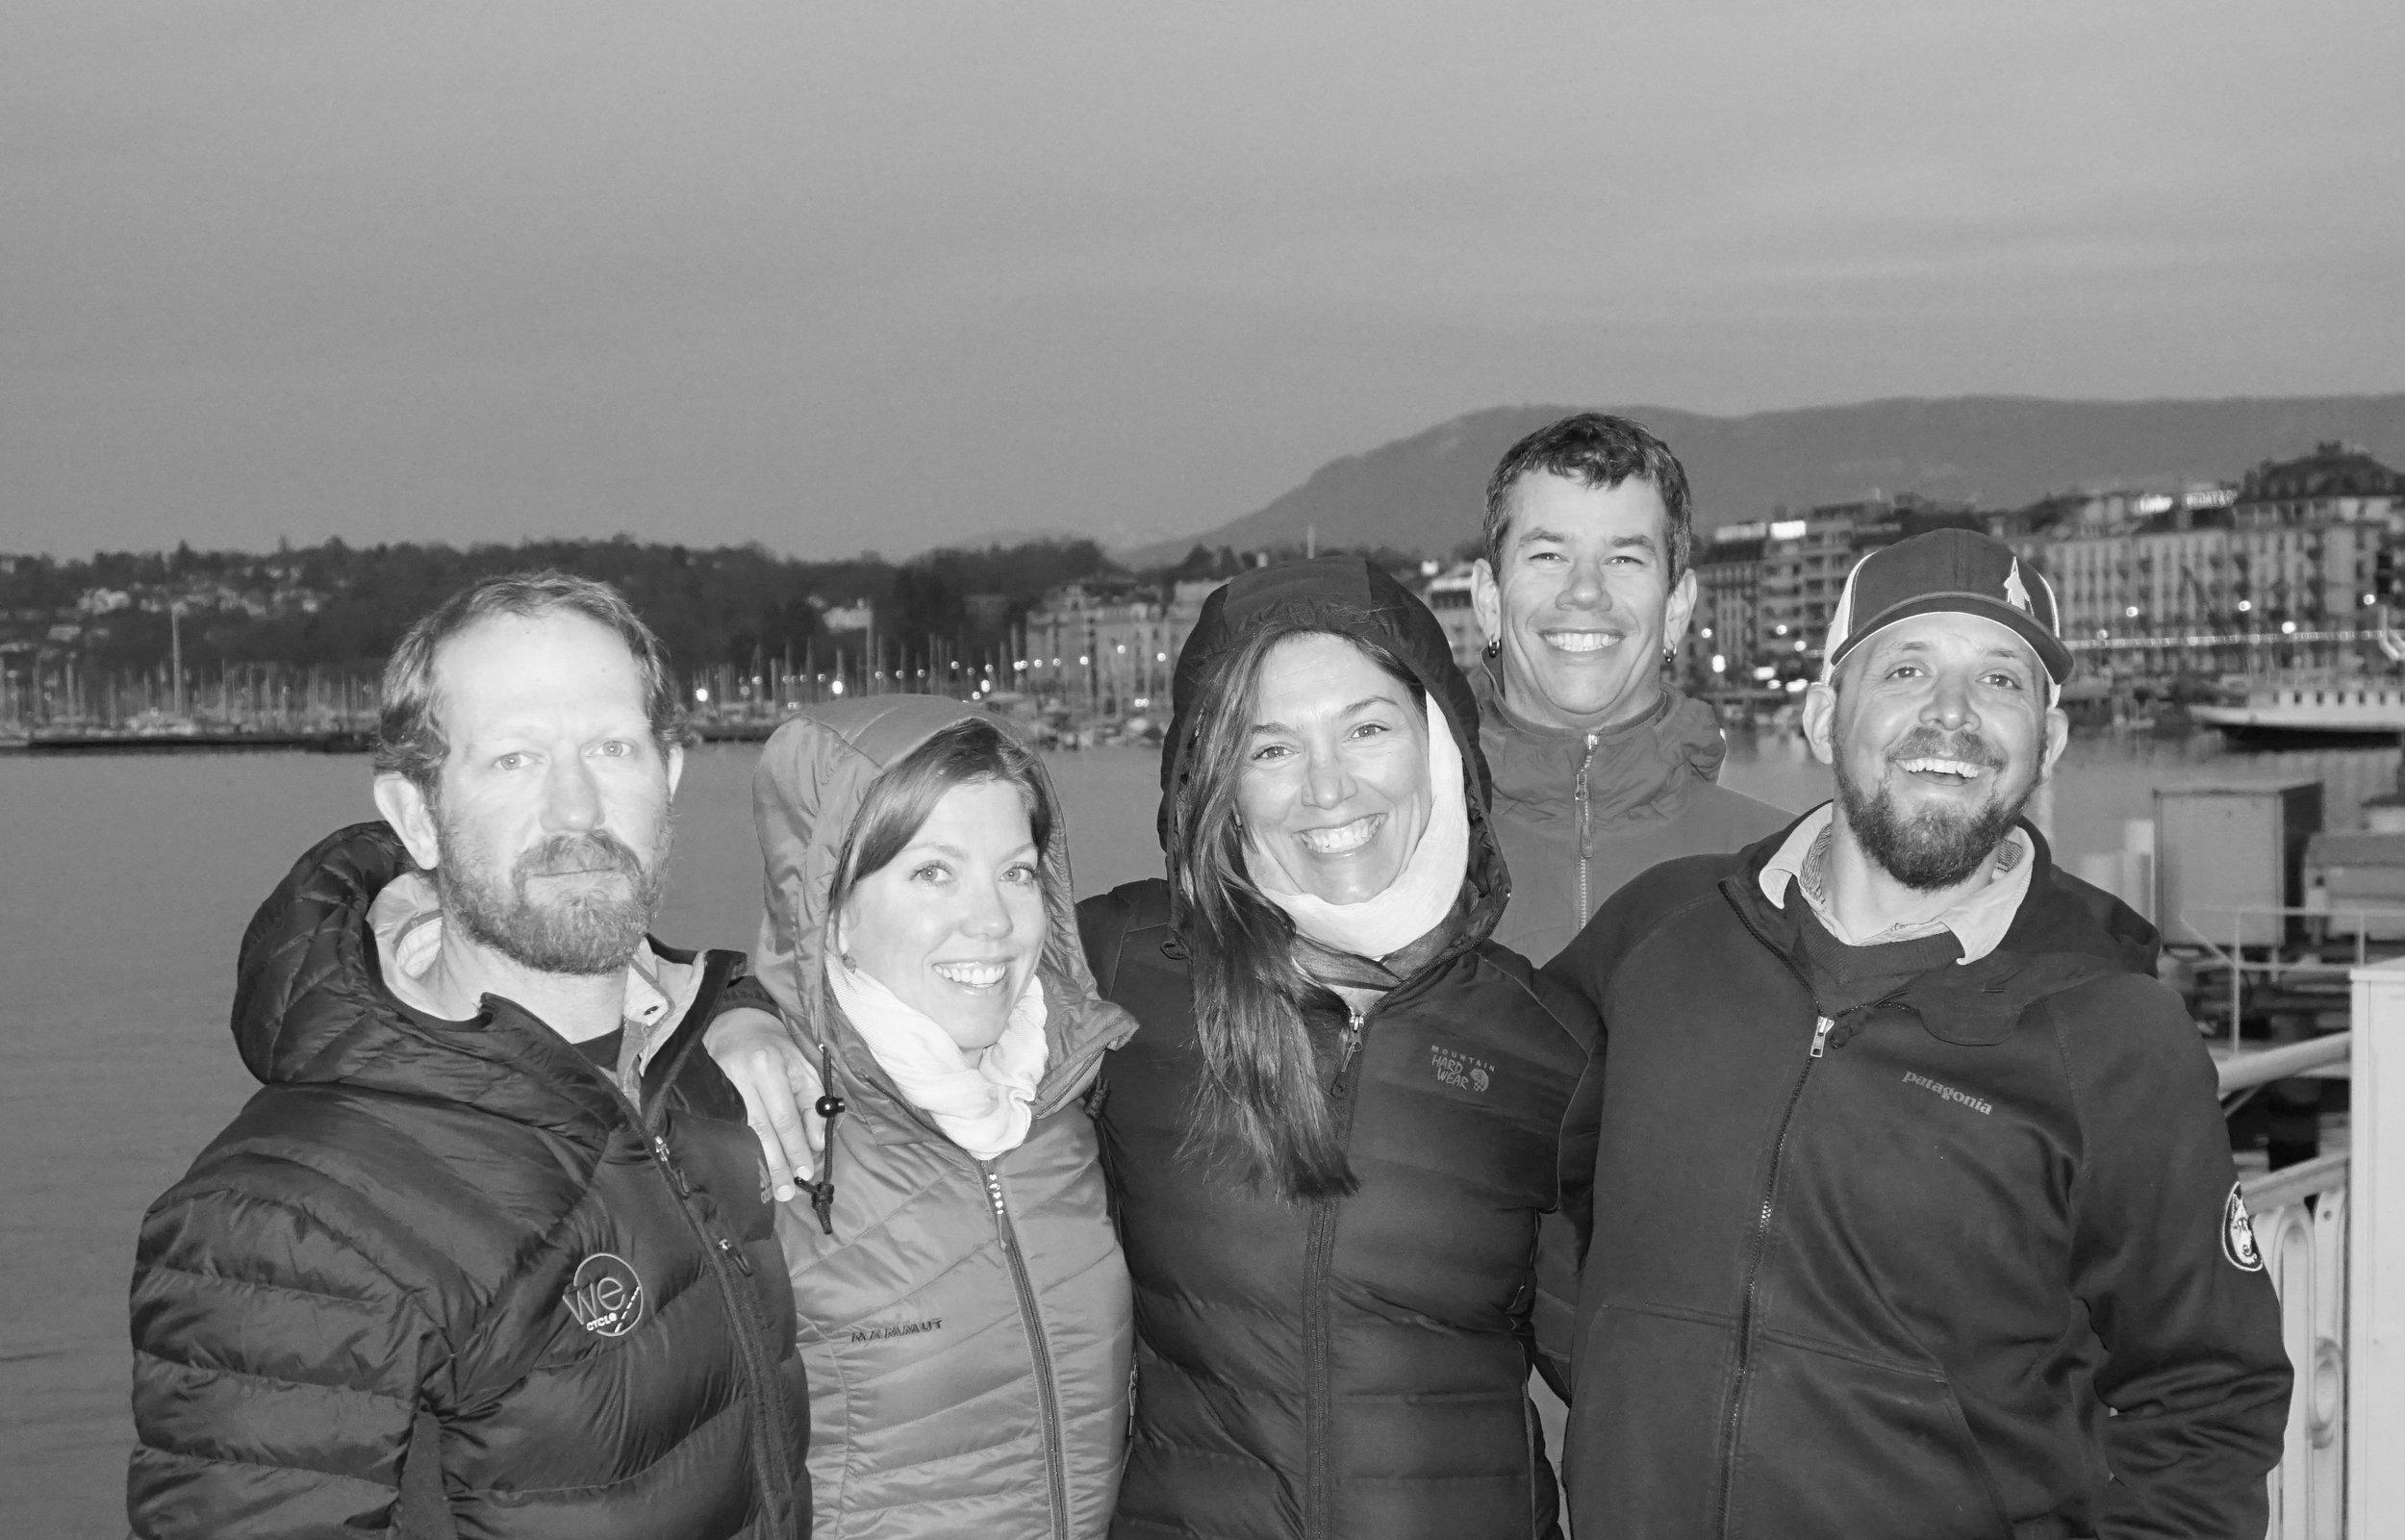 Tim Hugo, Kate Hugo, Heidi Hanssen, Owen Richard, and Charlie Wolf     Geneva, Switzerland. February 25, 2017